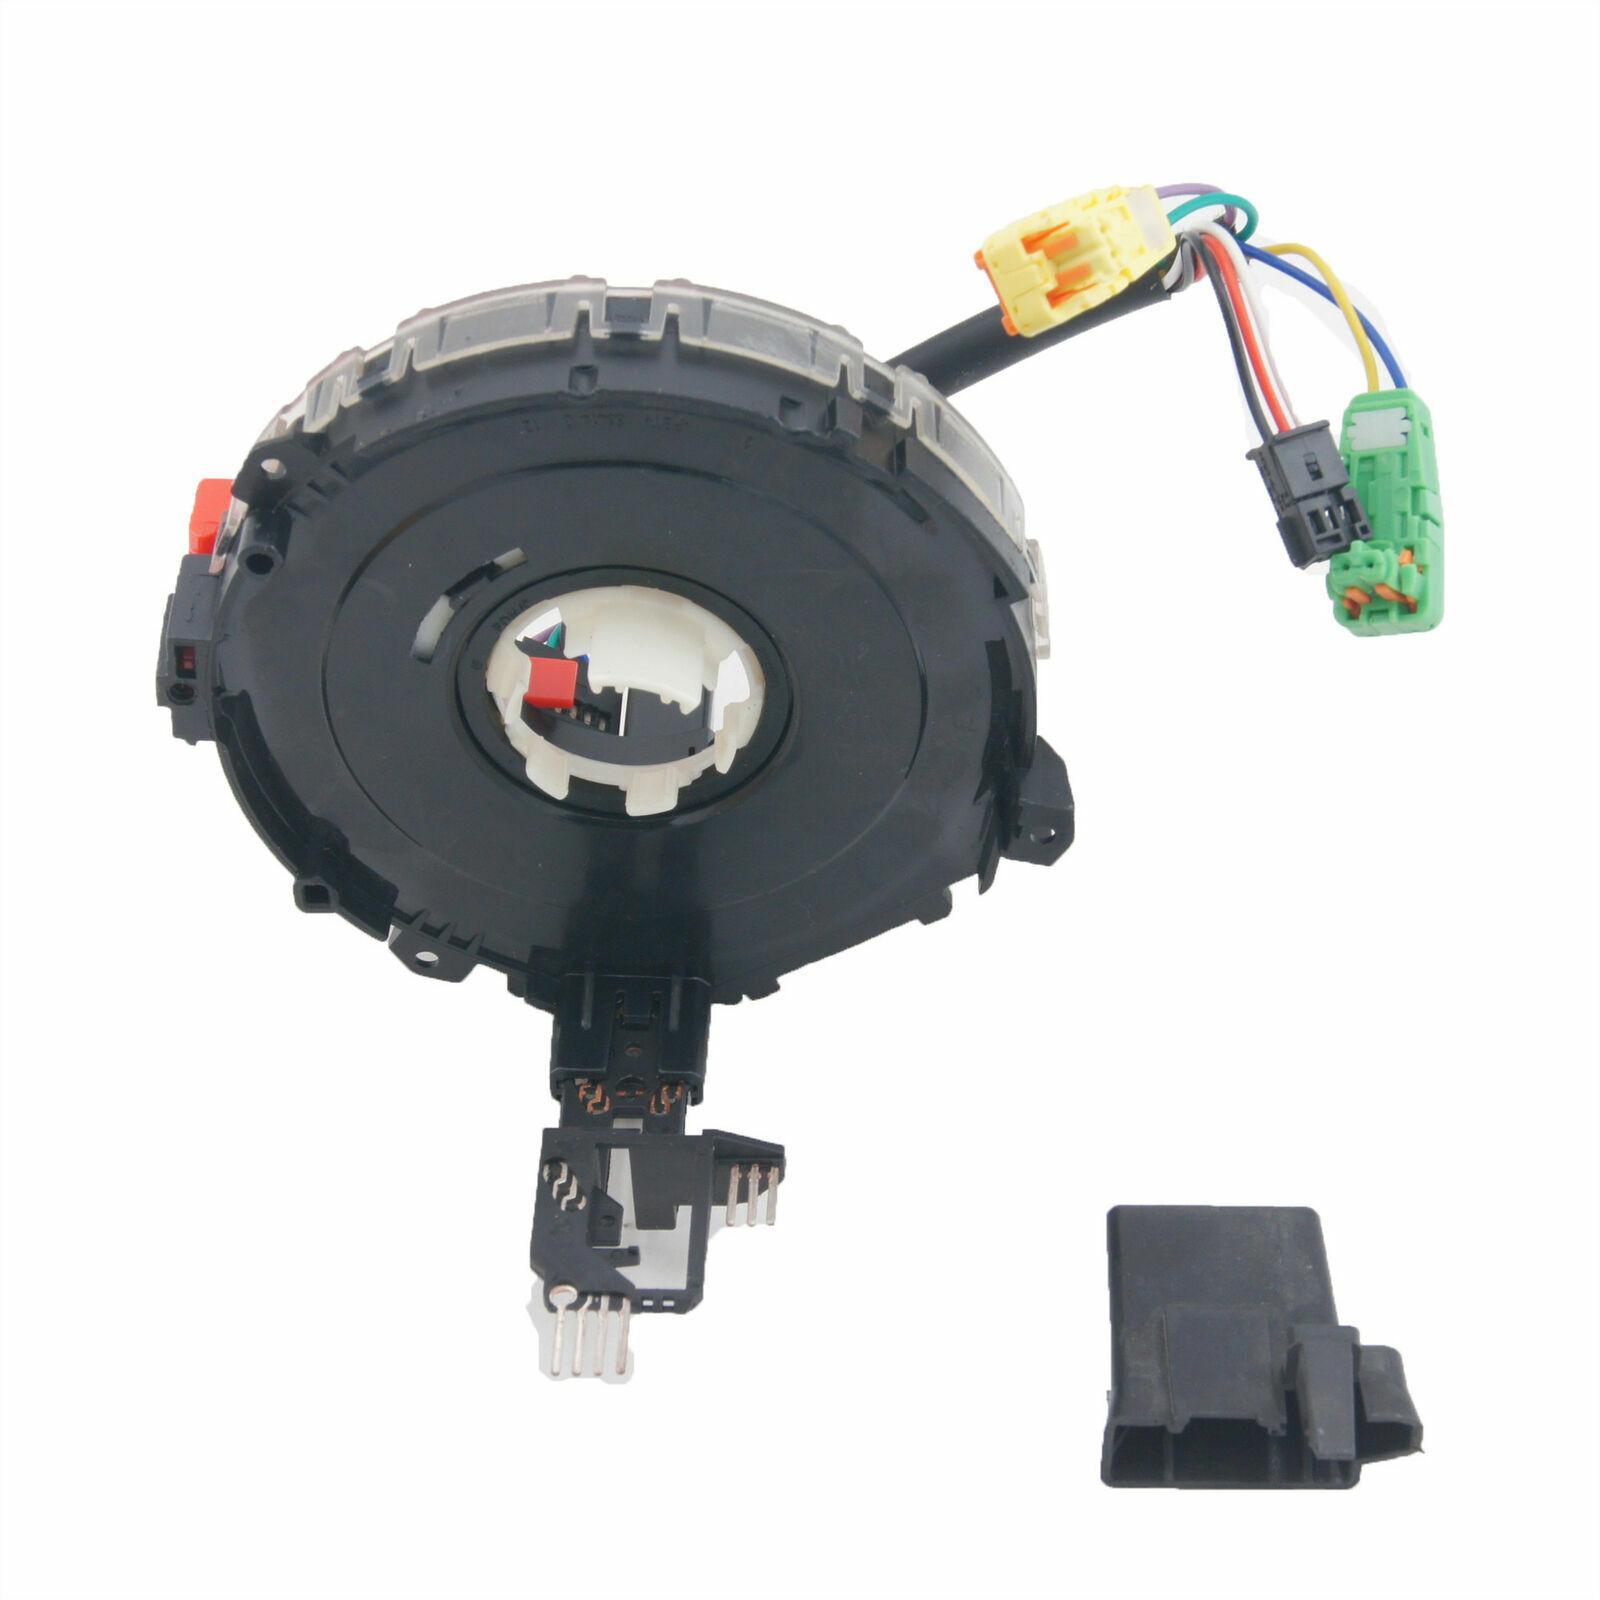 FEBI Airbag Clockspring Fits MERCEDES E-Class Platform//Chassis C216 1714640918